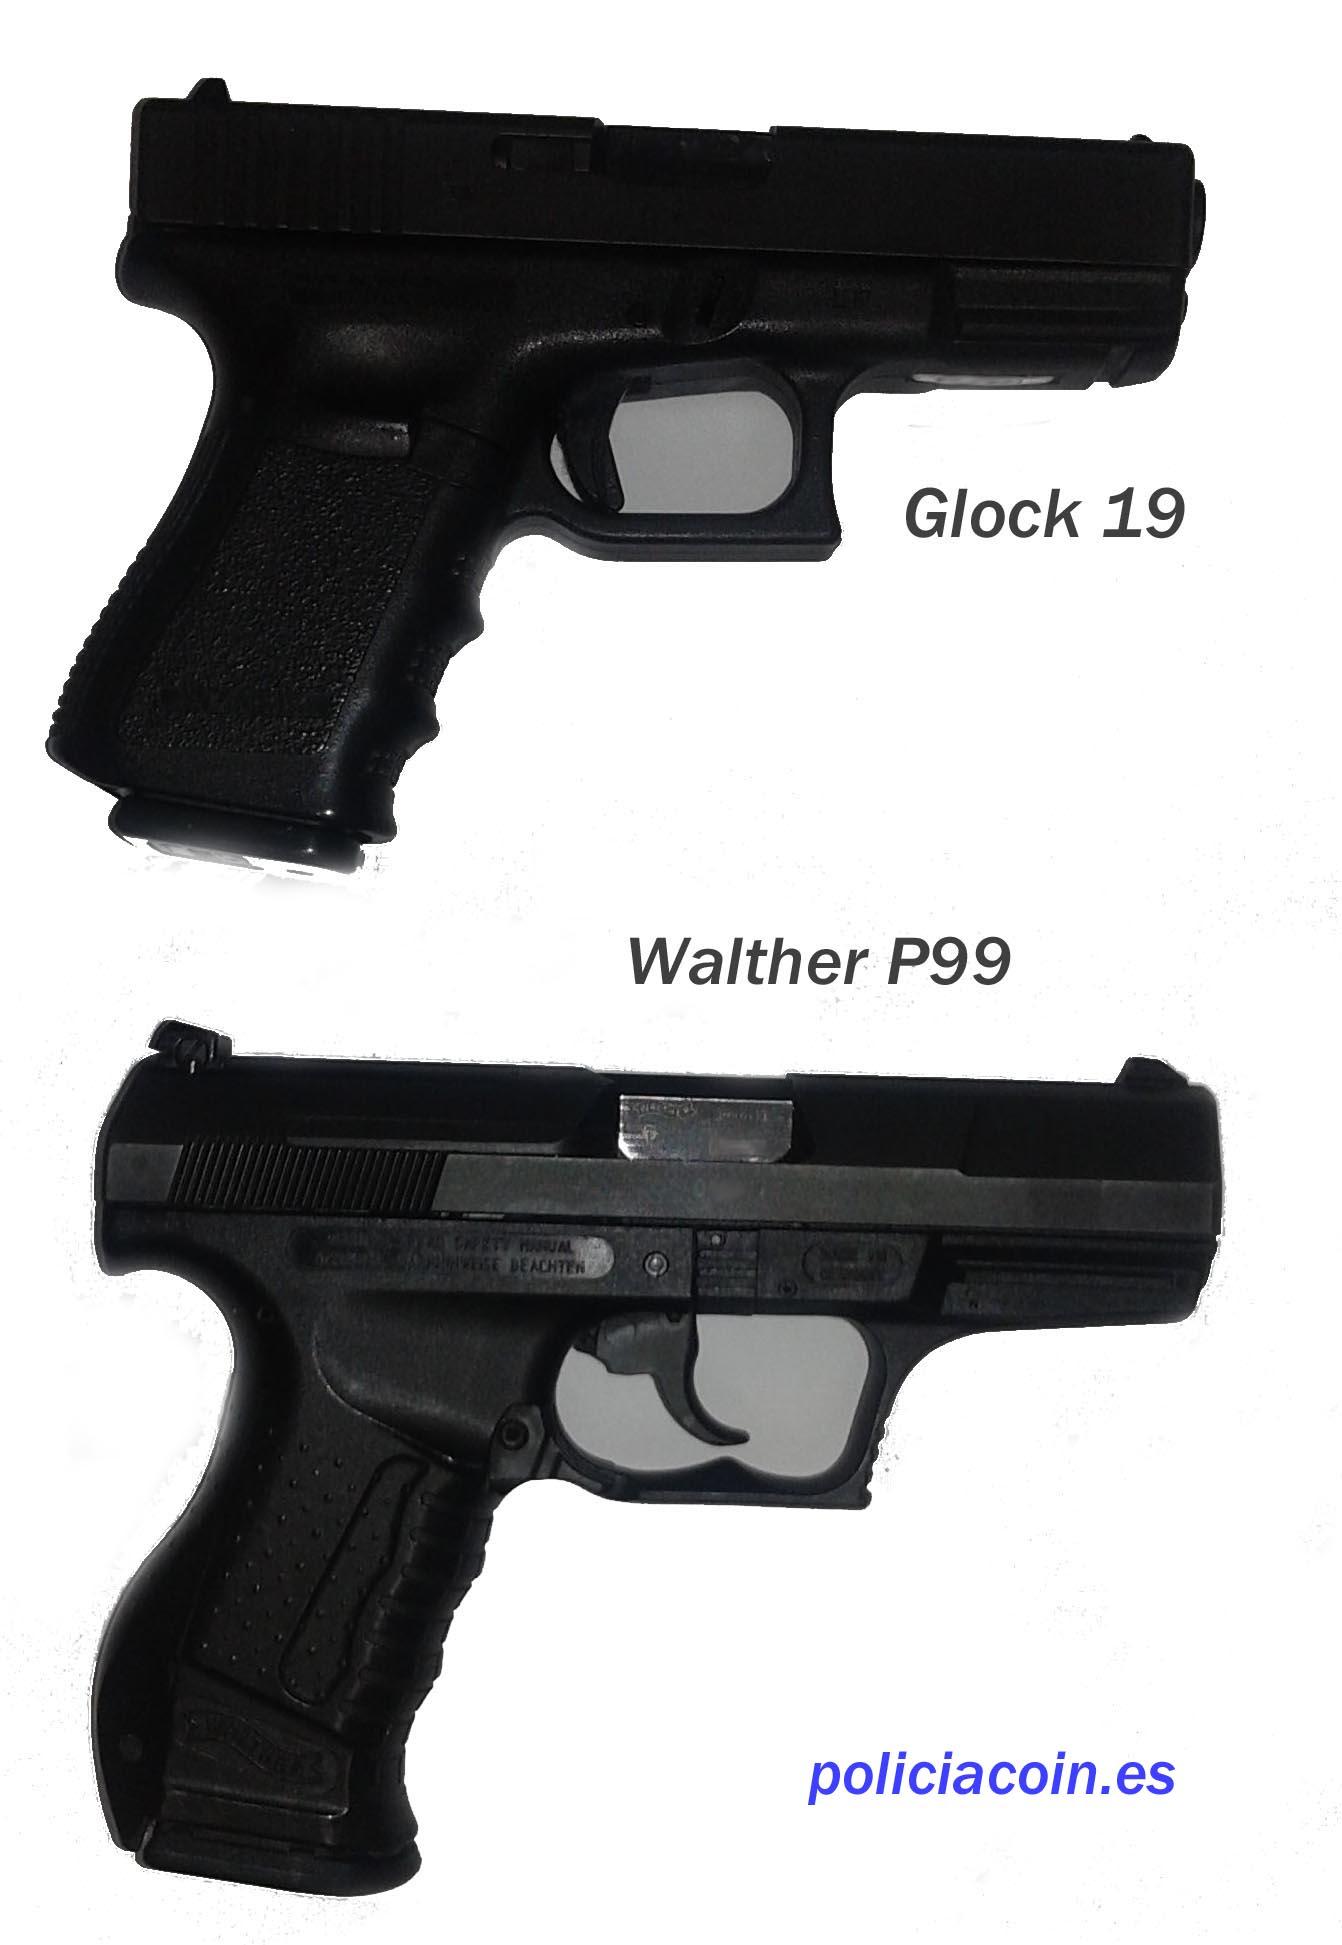 Walther vs Glock